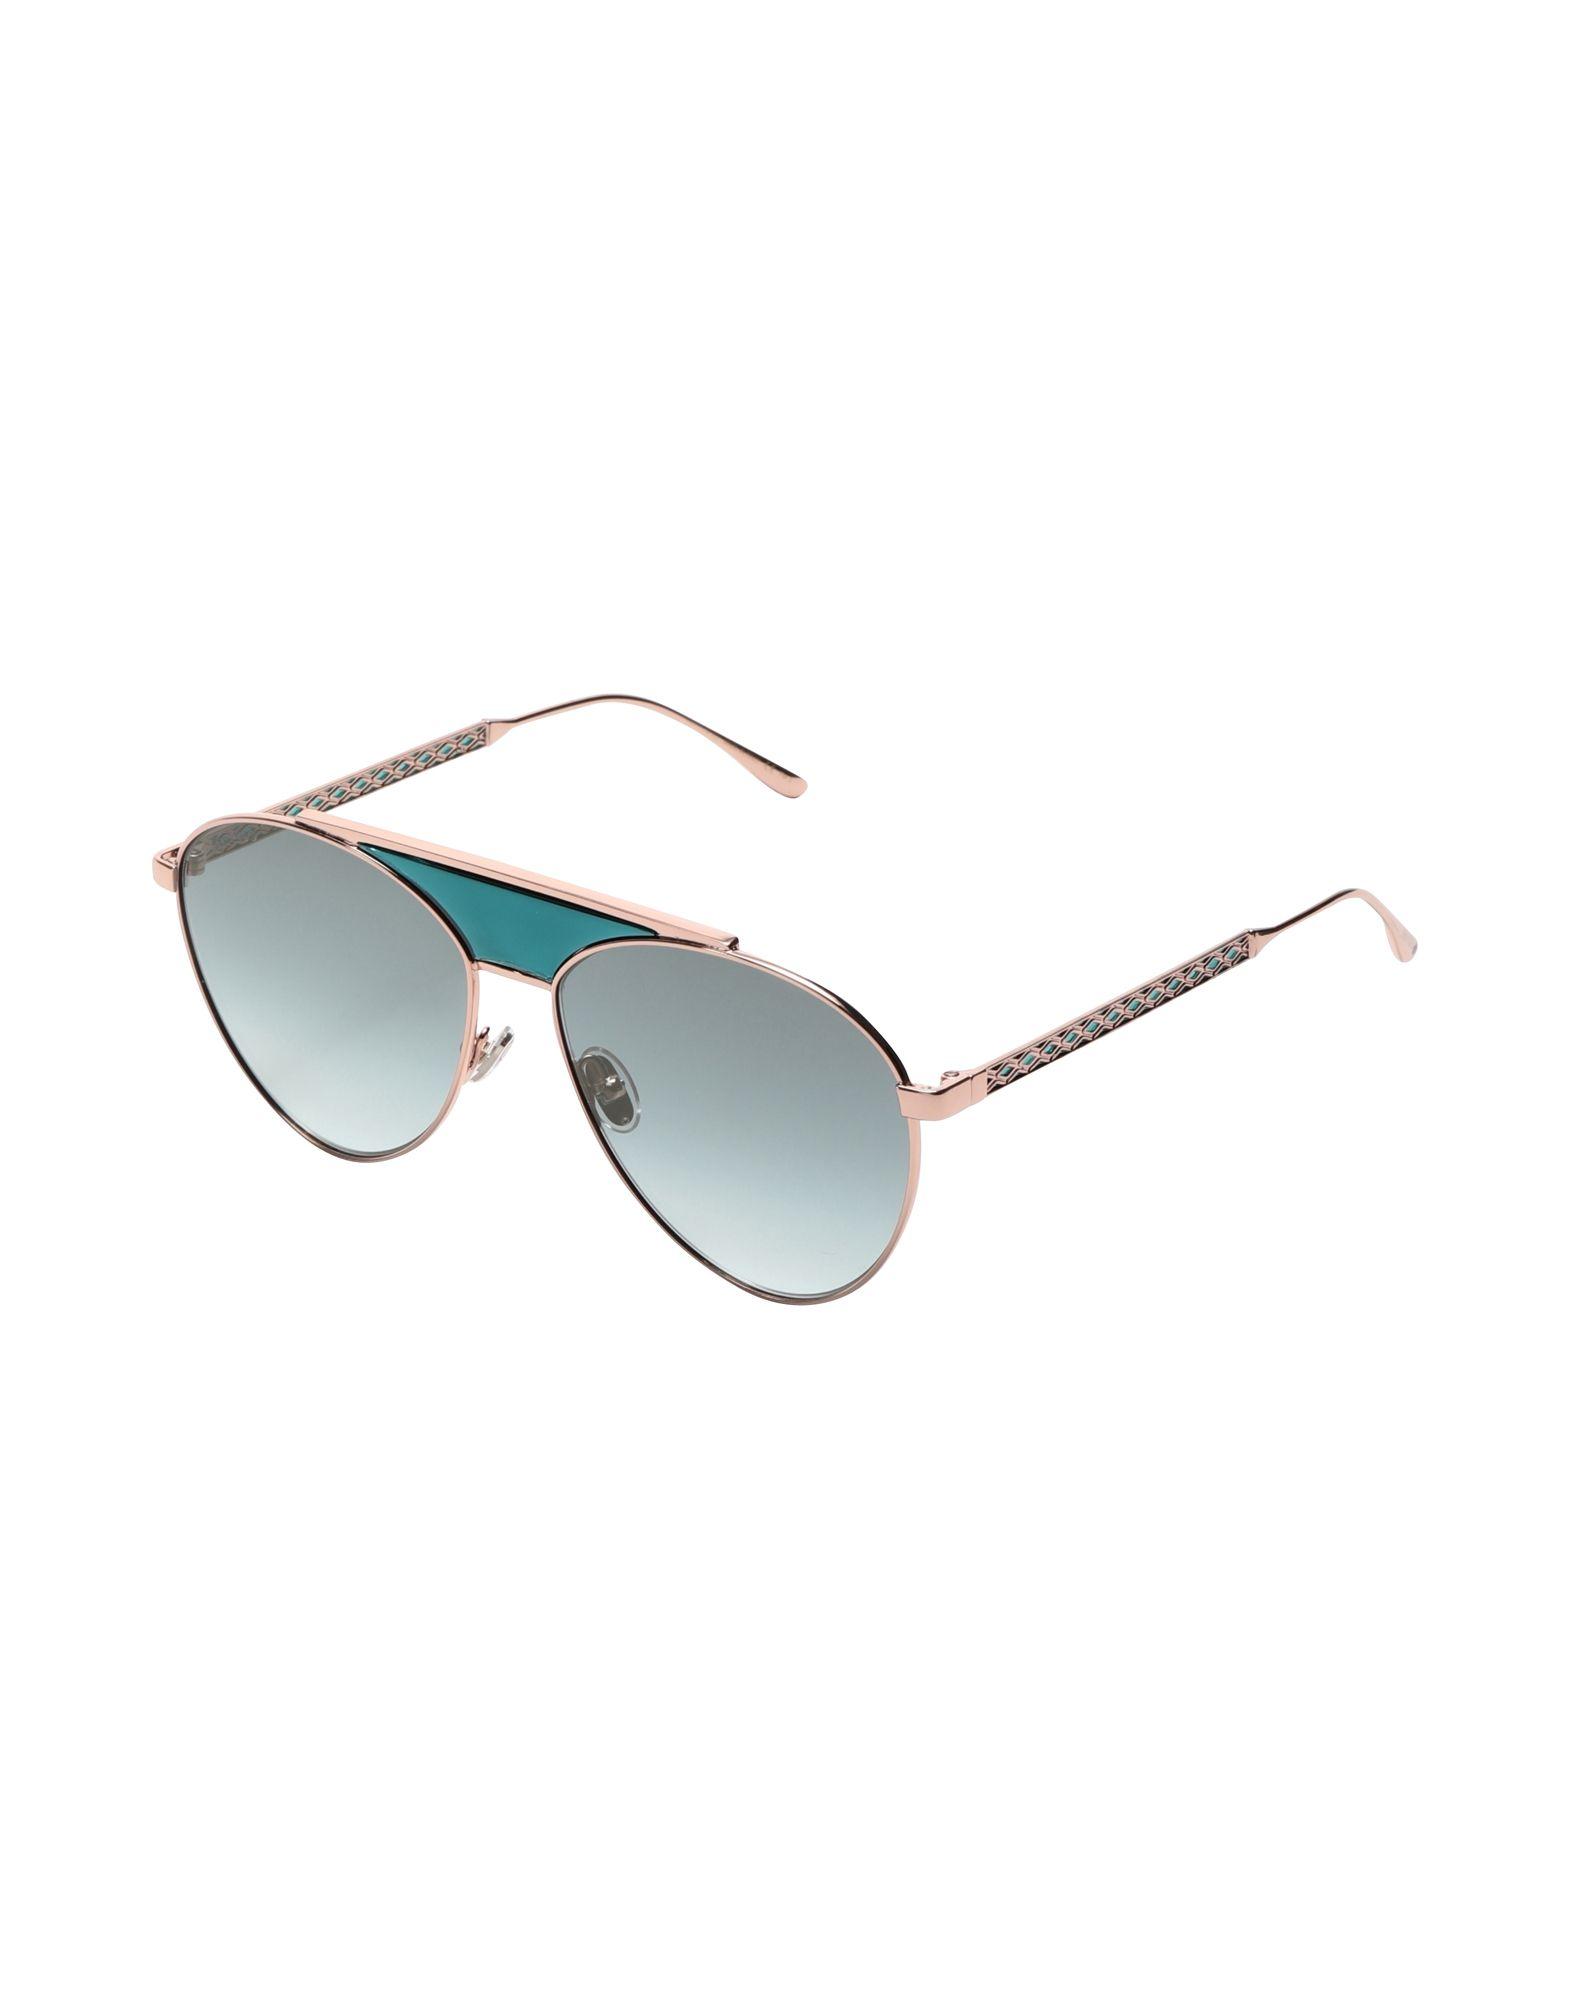 JIMMY CHOO Солнечные очки jimmy choo солнечные очки